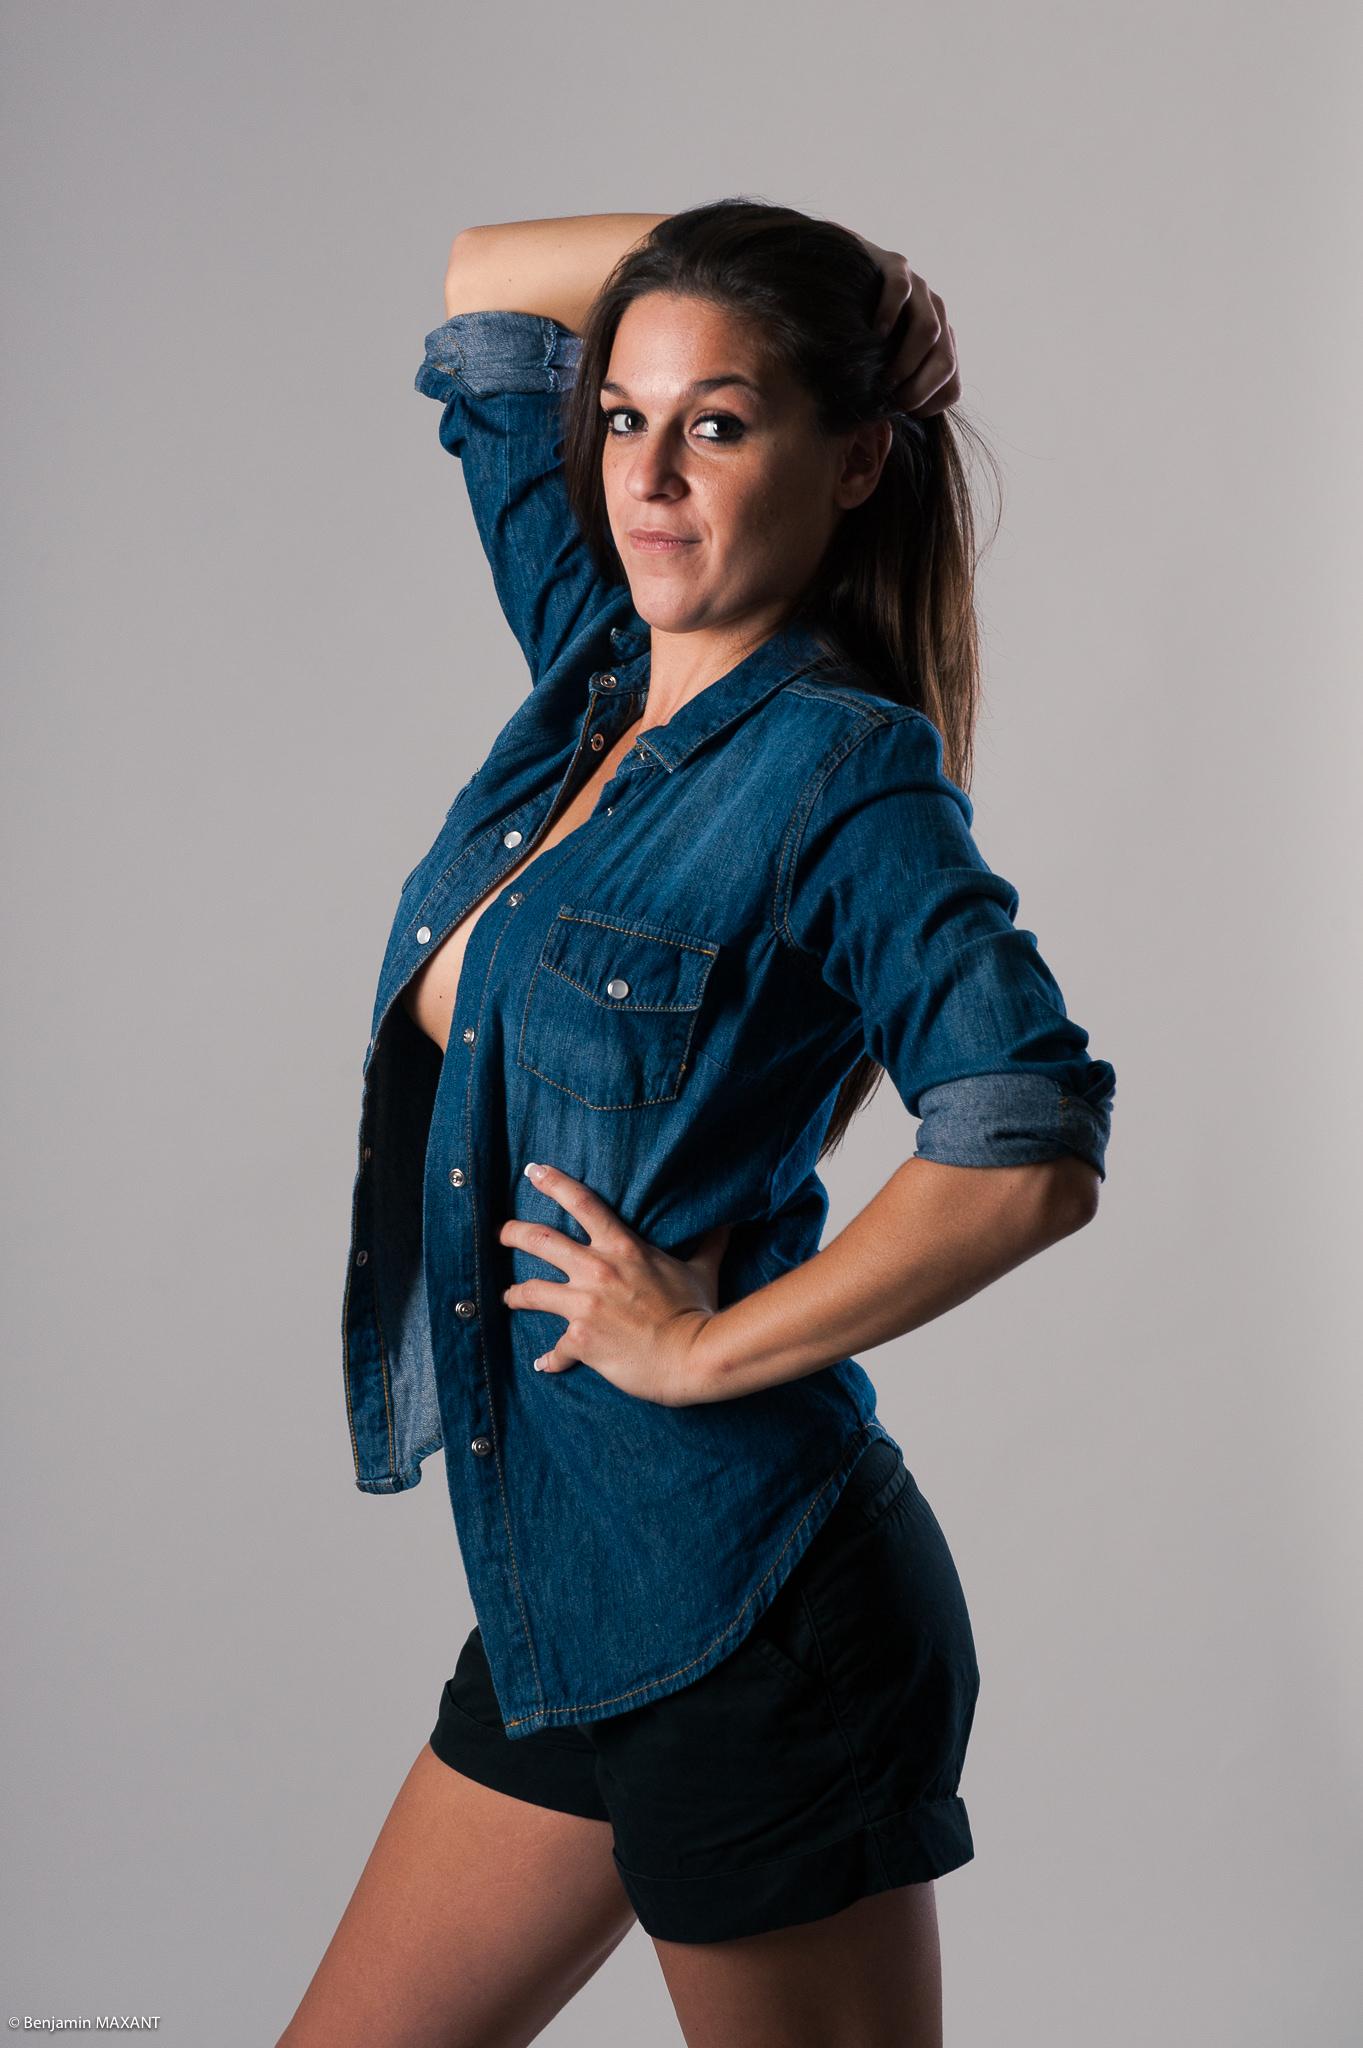 Shooting sexy chemise jean ouverte en studio avec Elise